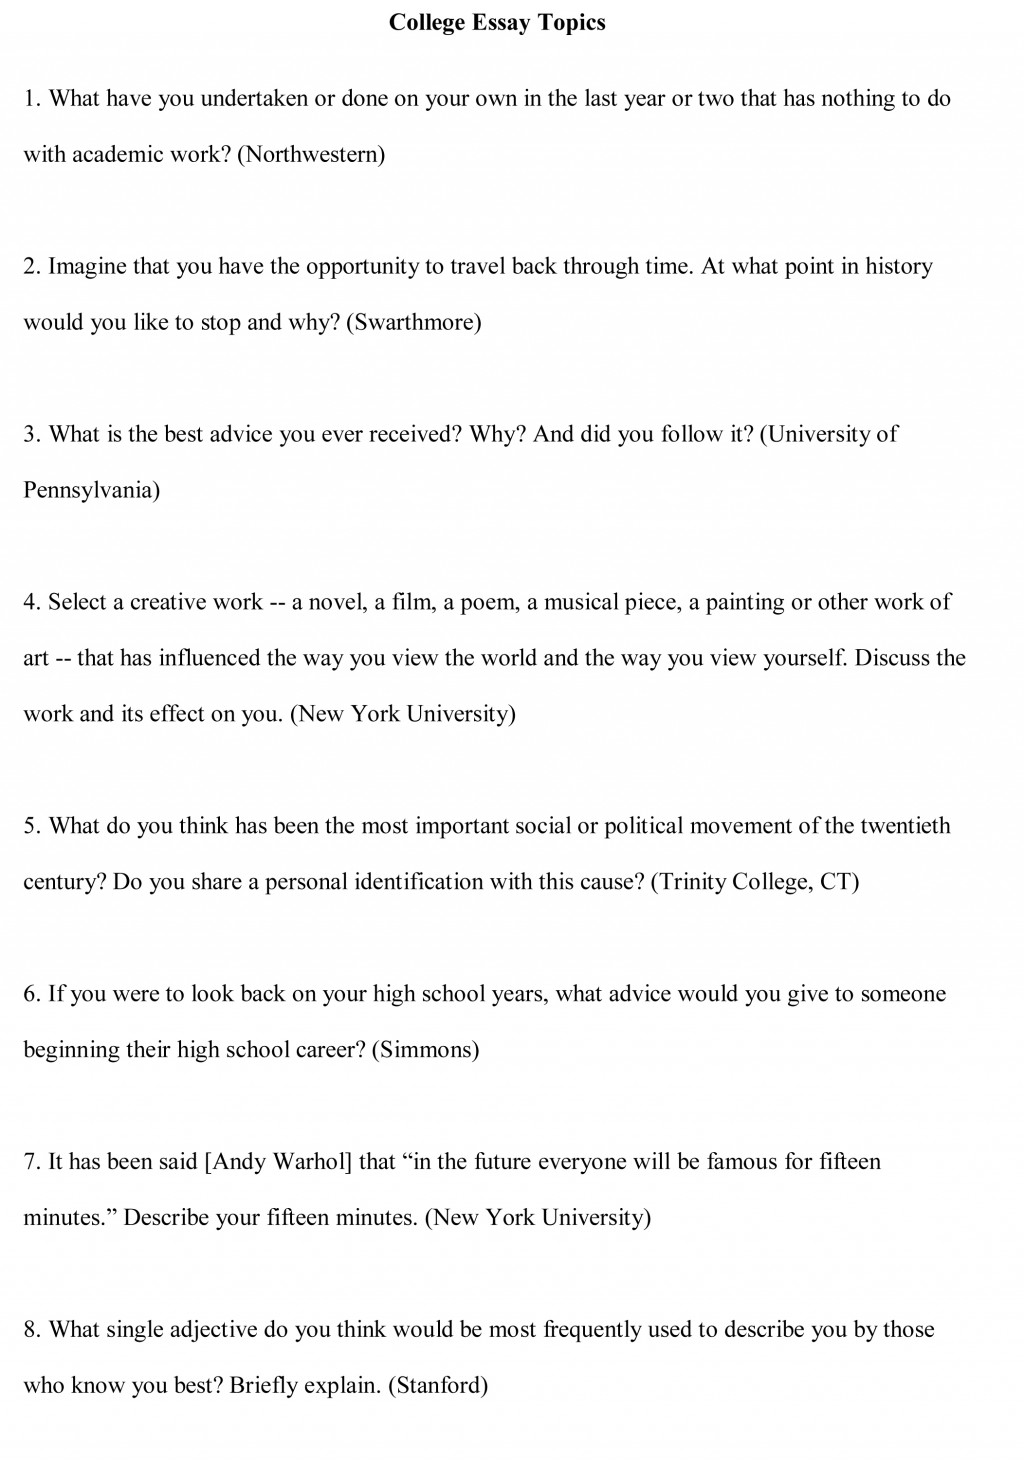 017 College Essay Topics Free Sample1 Good Persuasive Amazing For Argumentative High School Large